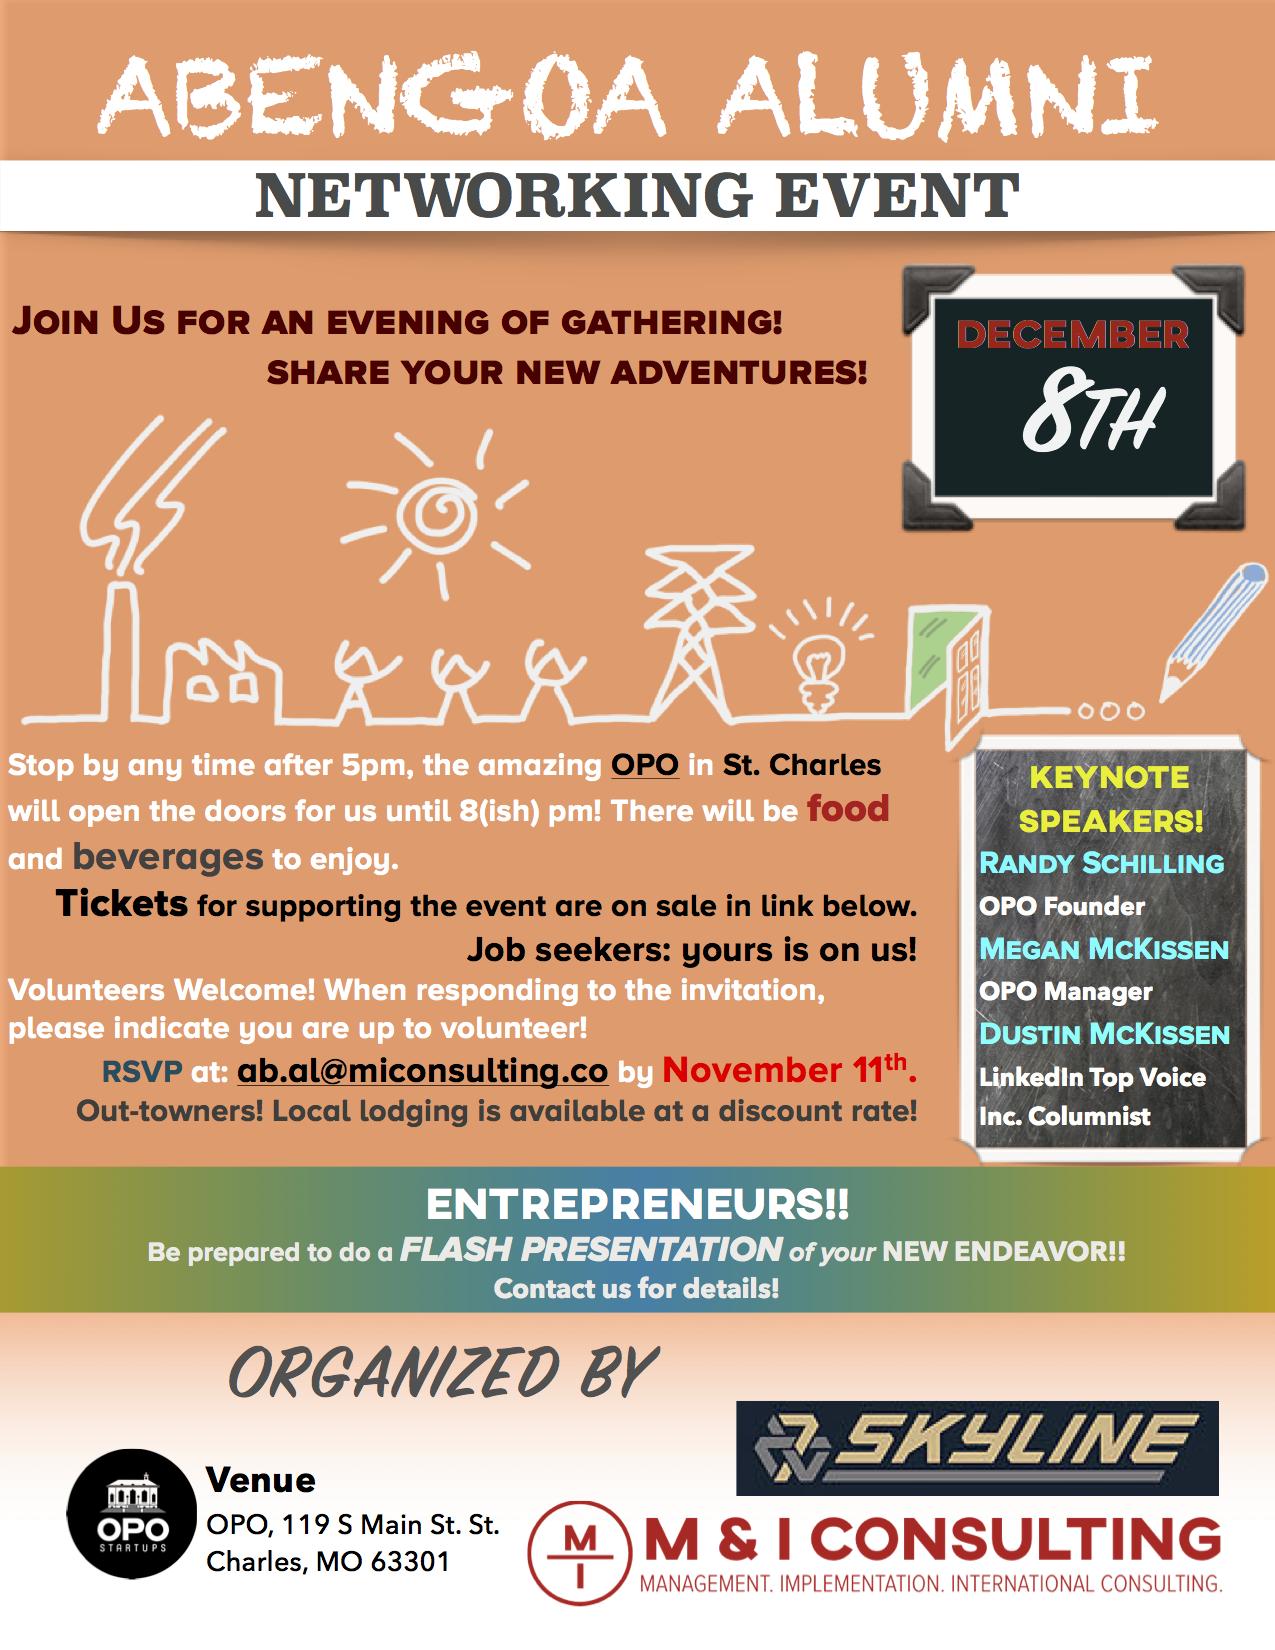 Abengoa Alumni networking evening